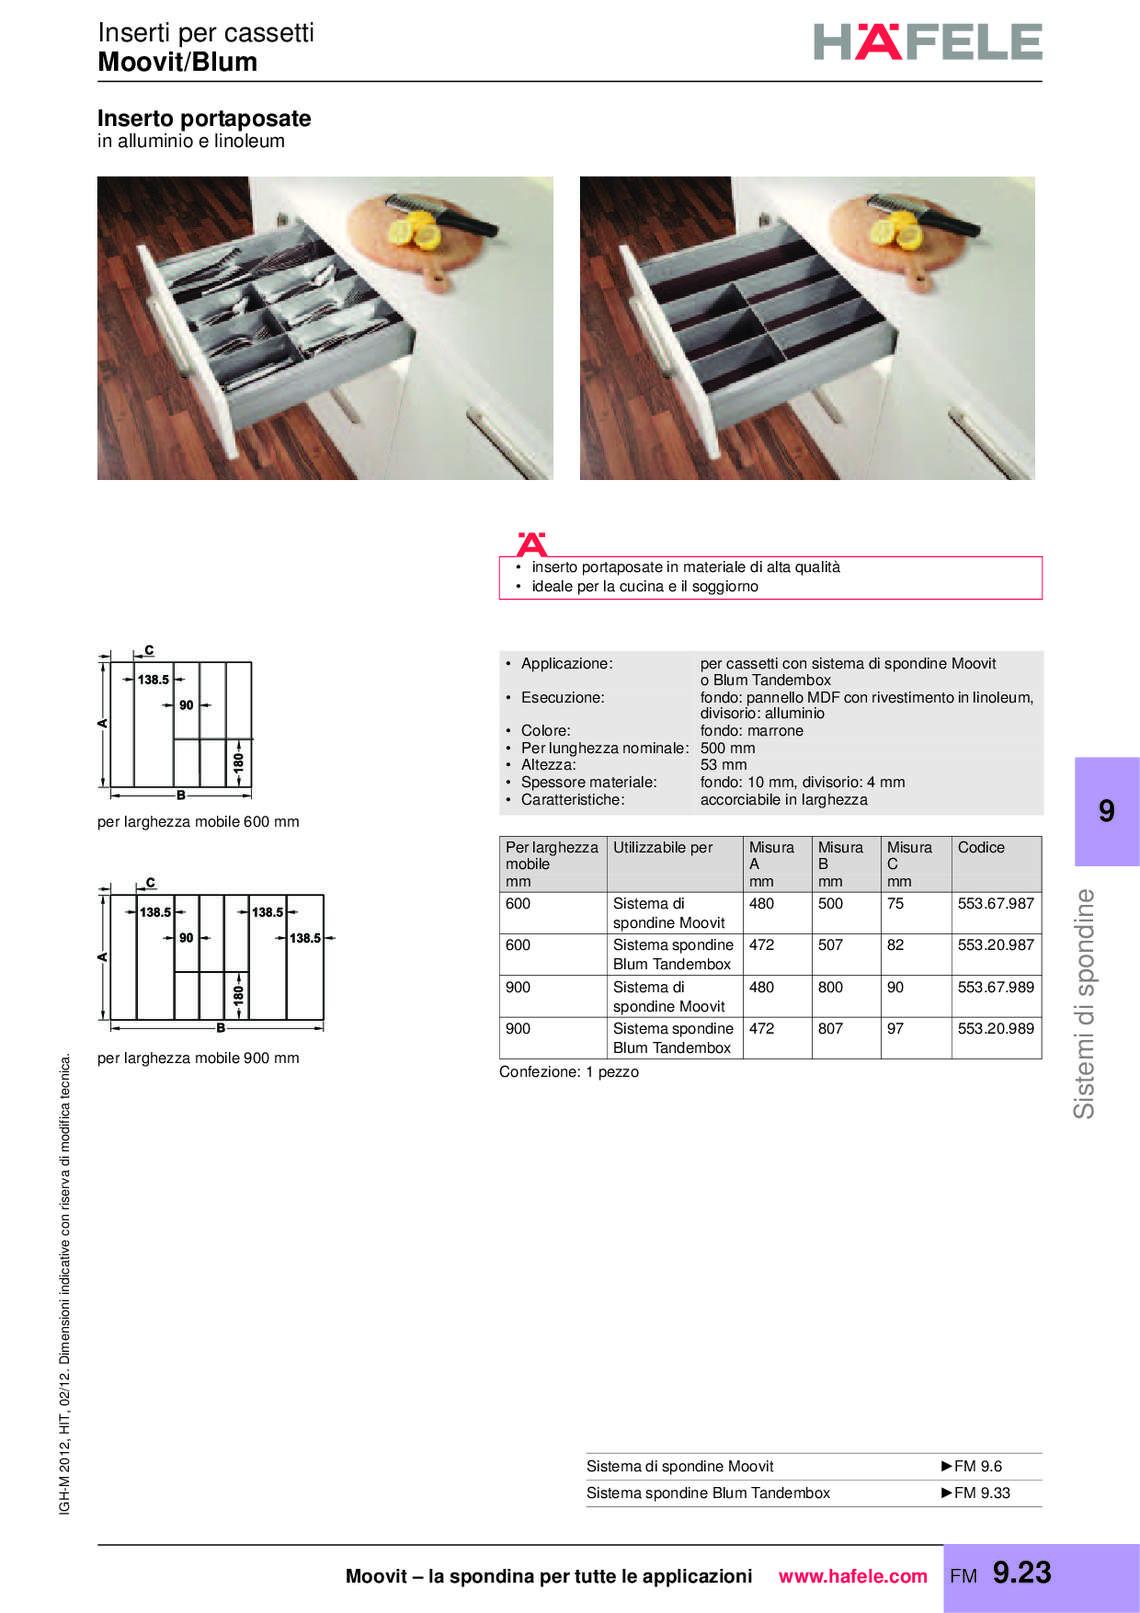 hafele-spondine-e-guide-per-mobili_40_036.jpg